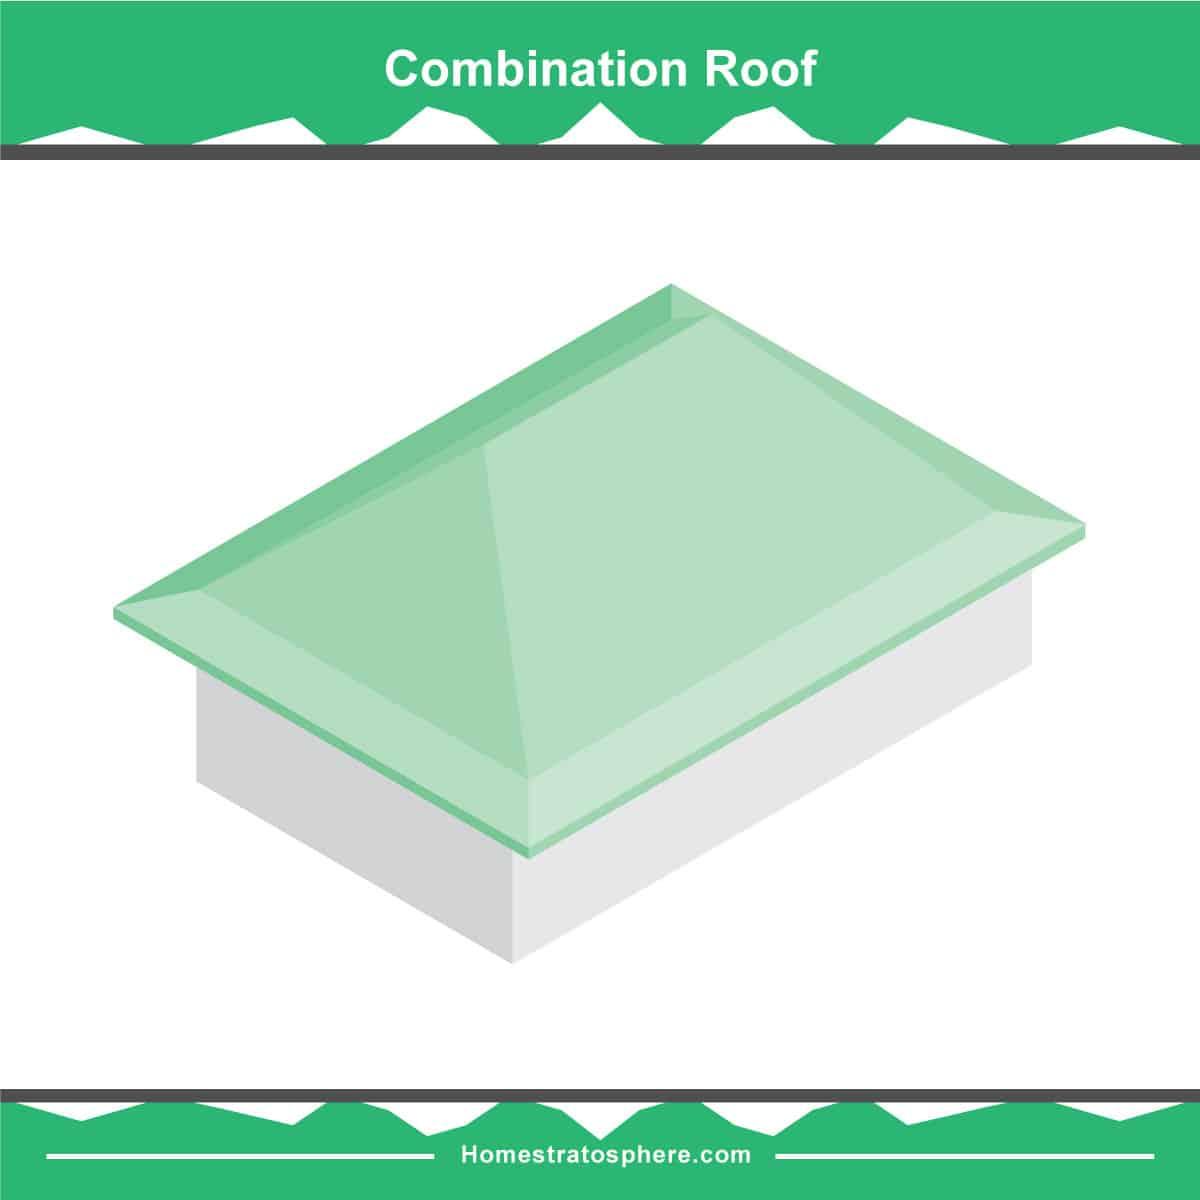 Combination roof diagram